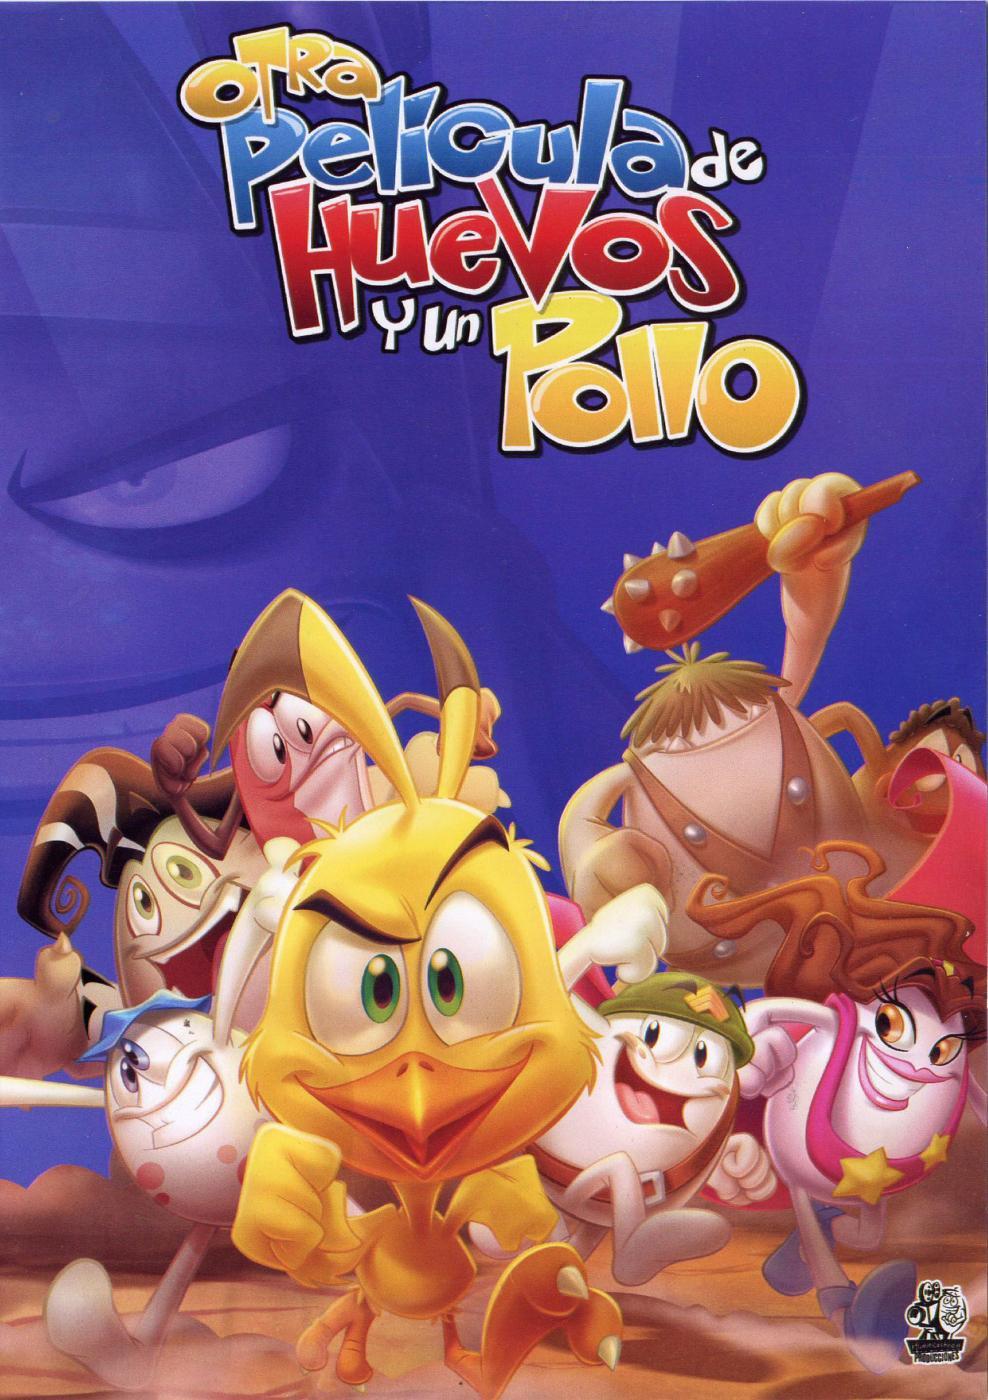 Приключения яиц и цыпленка - (Otra pelicula de huevos y un pollo)